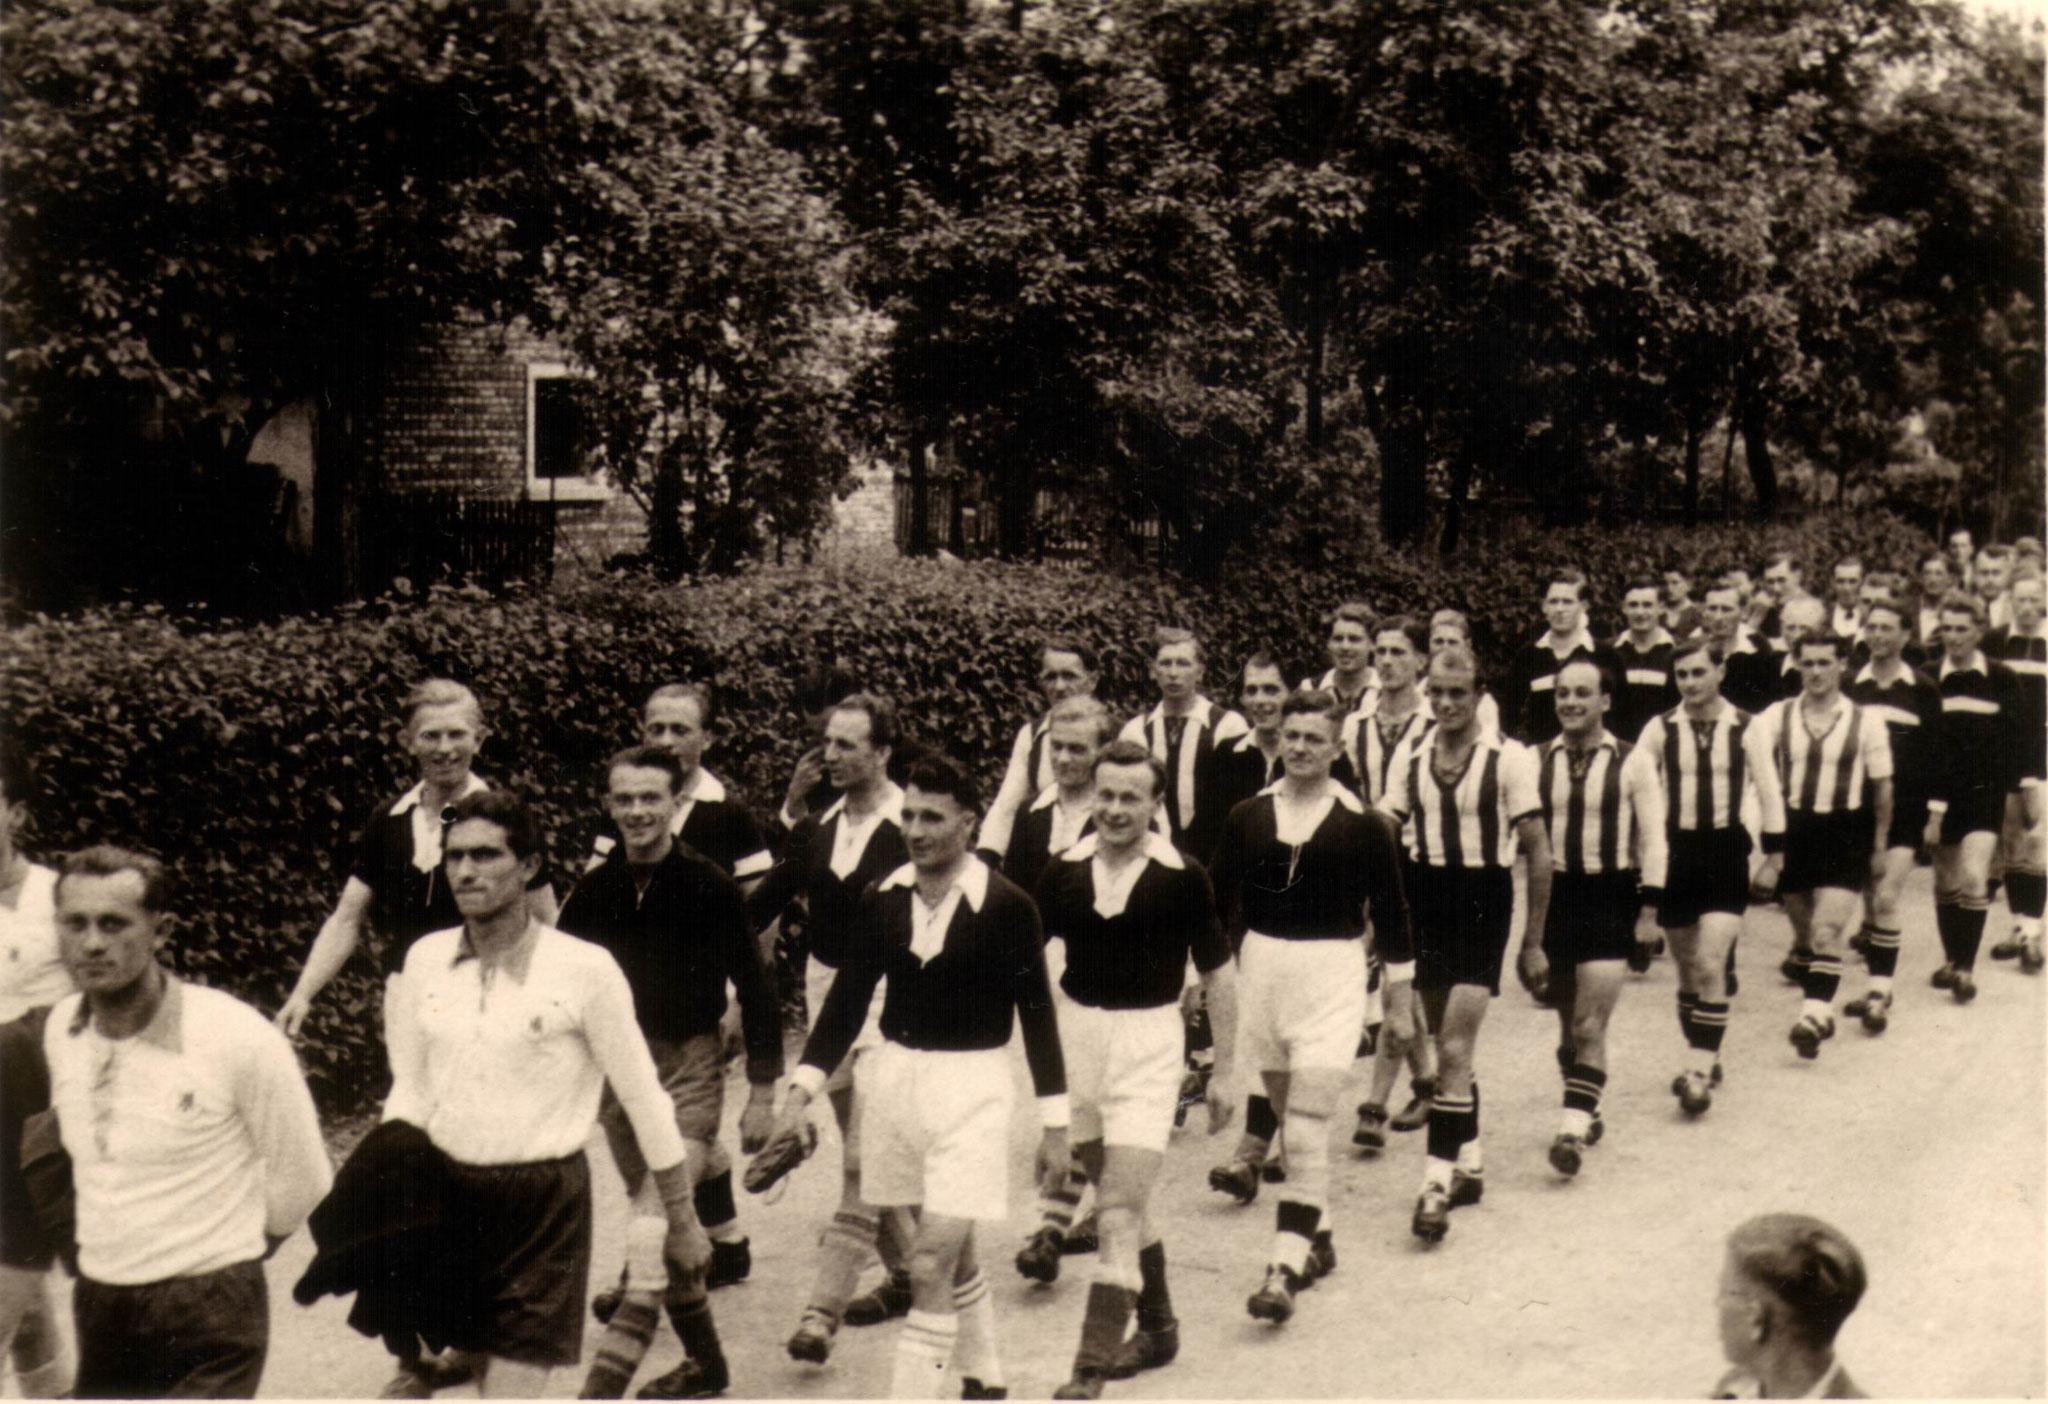 Sportfest 1949 -  Umzug durchs  Dorf